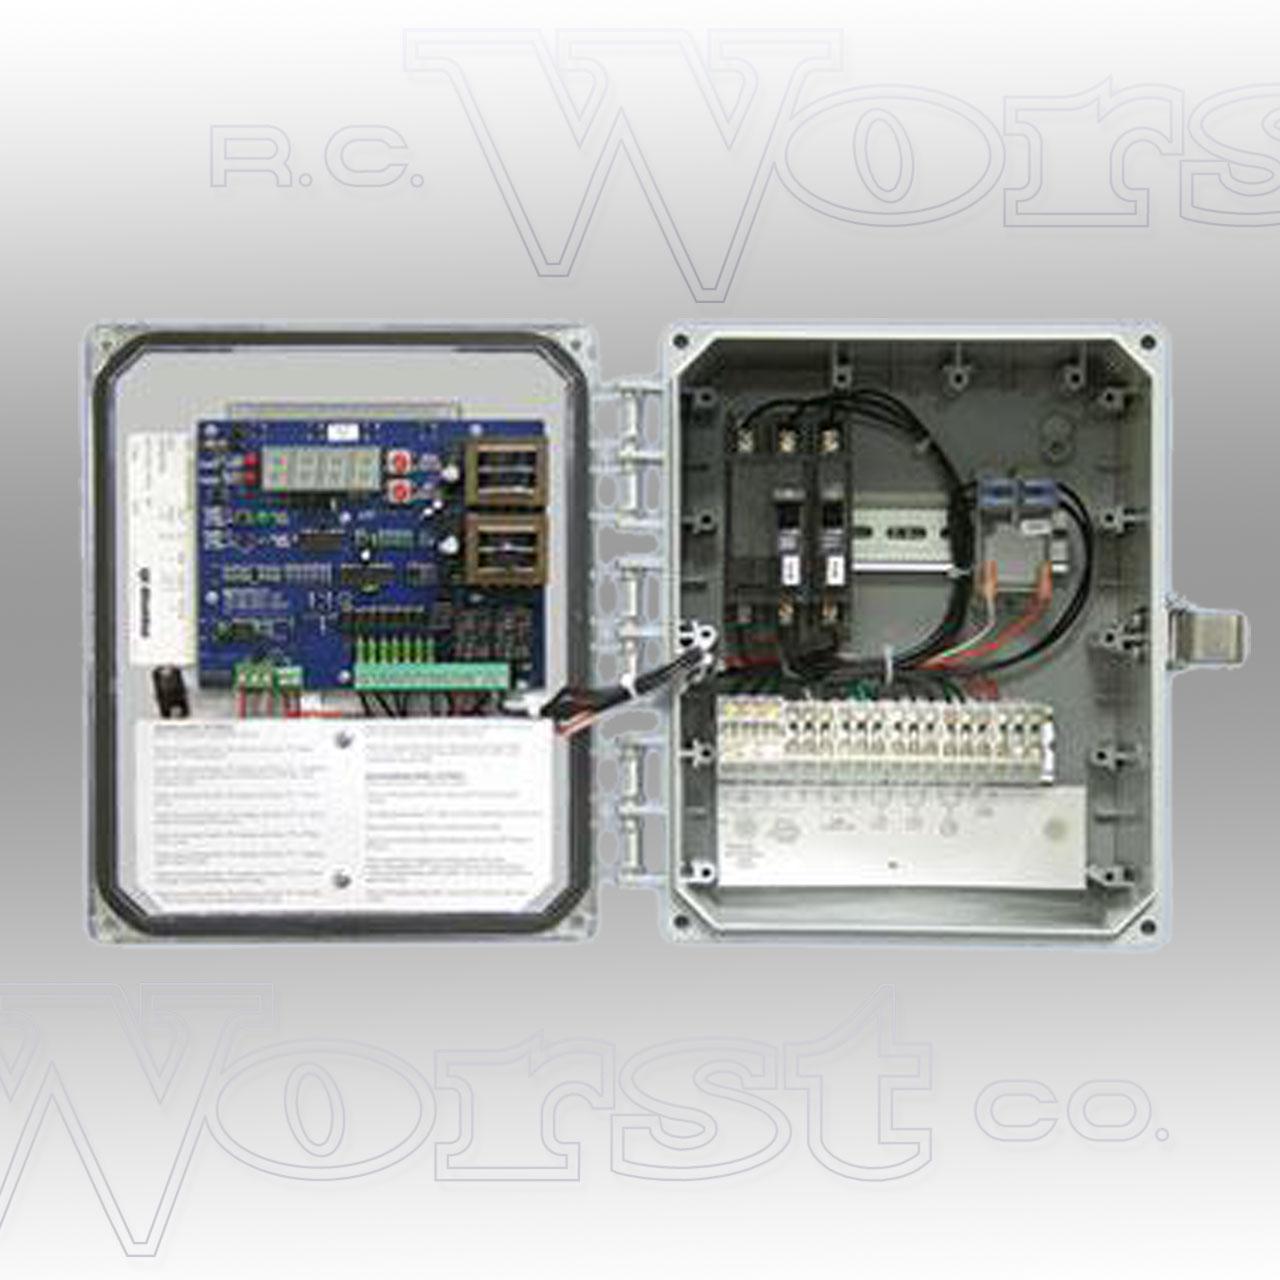 hight resolution of sje rhombus sje rhombus ez series plugger control panel 120 volt sjeezp